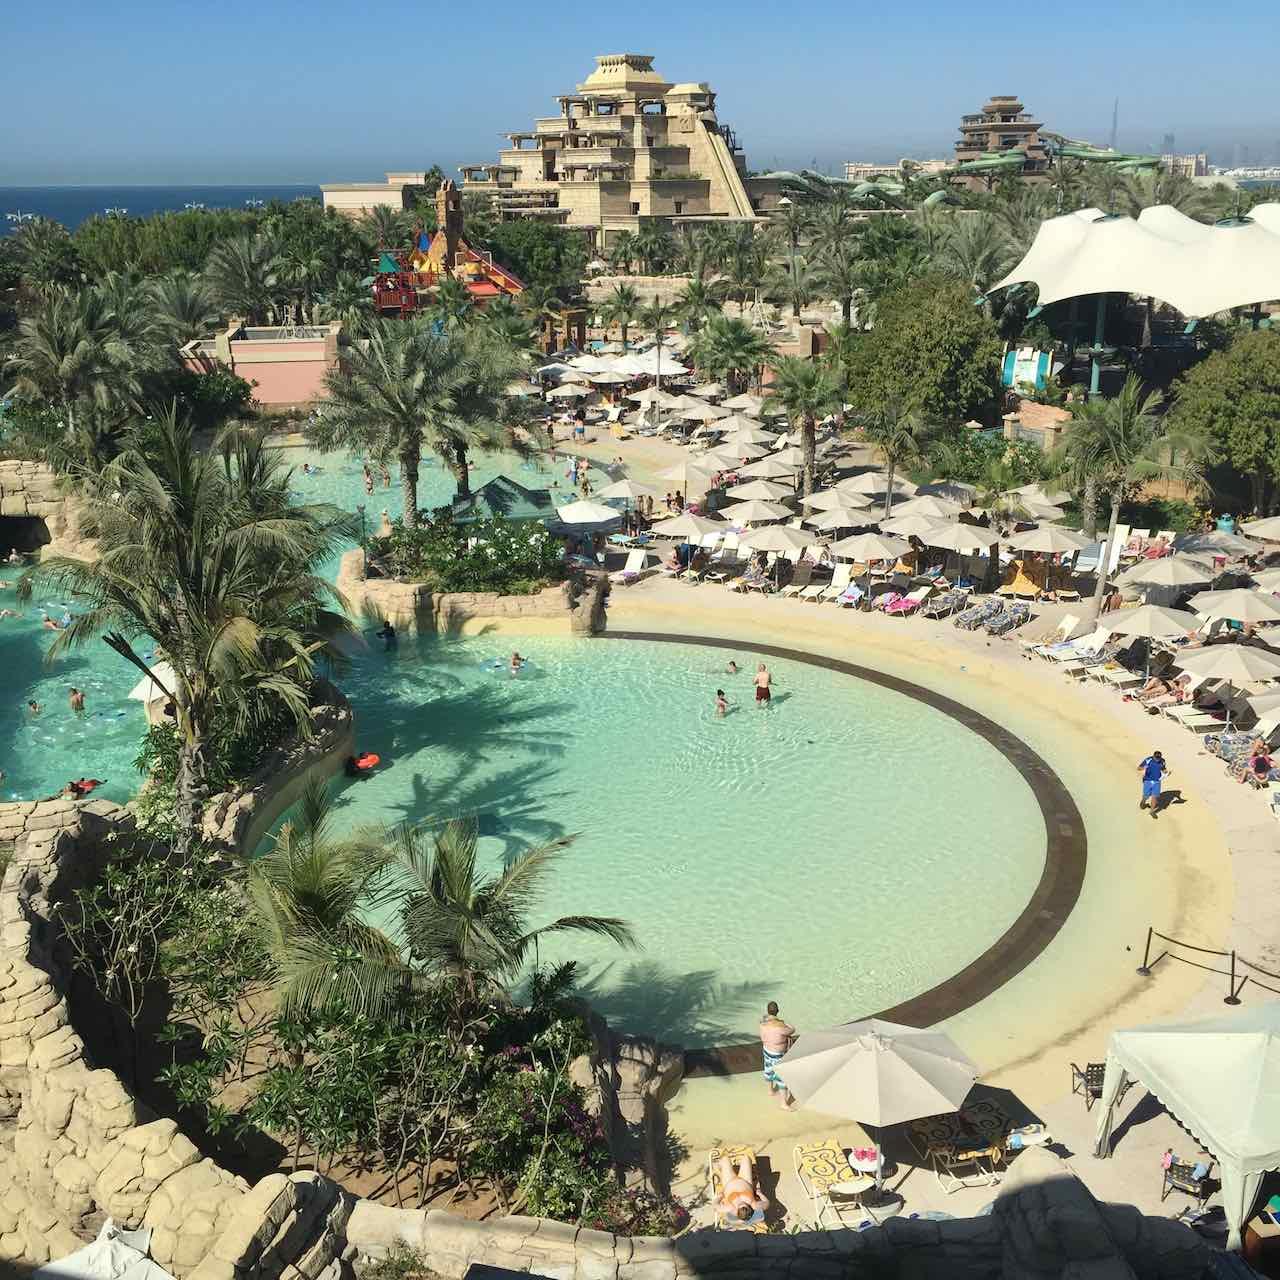 beach-sea-coast-vacation-swimming-pool-palm-693956-pxhere.com